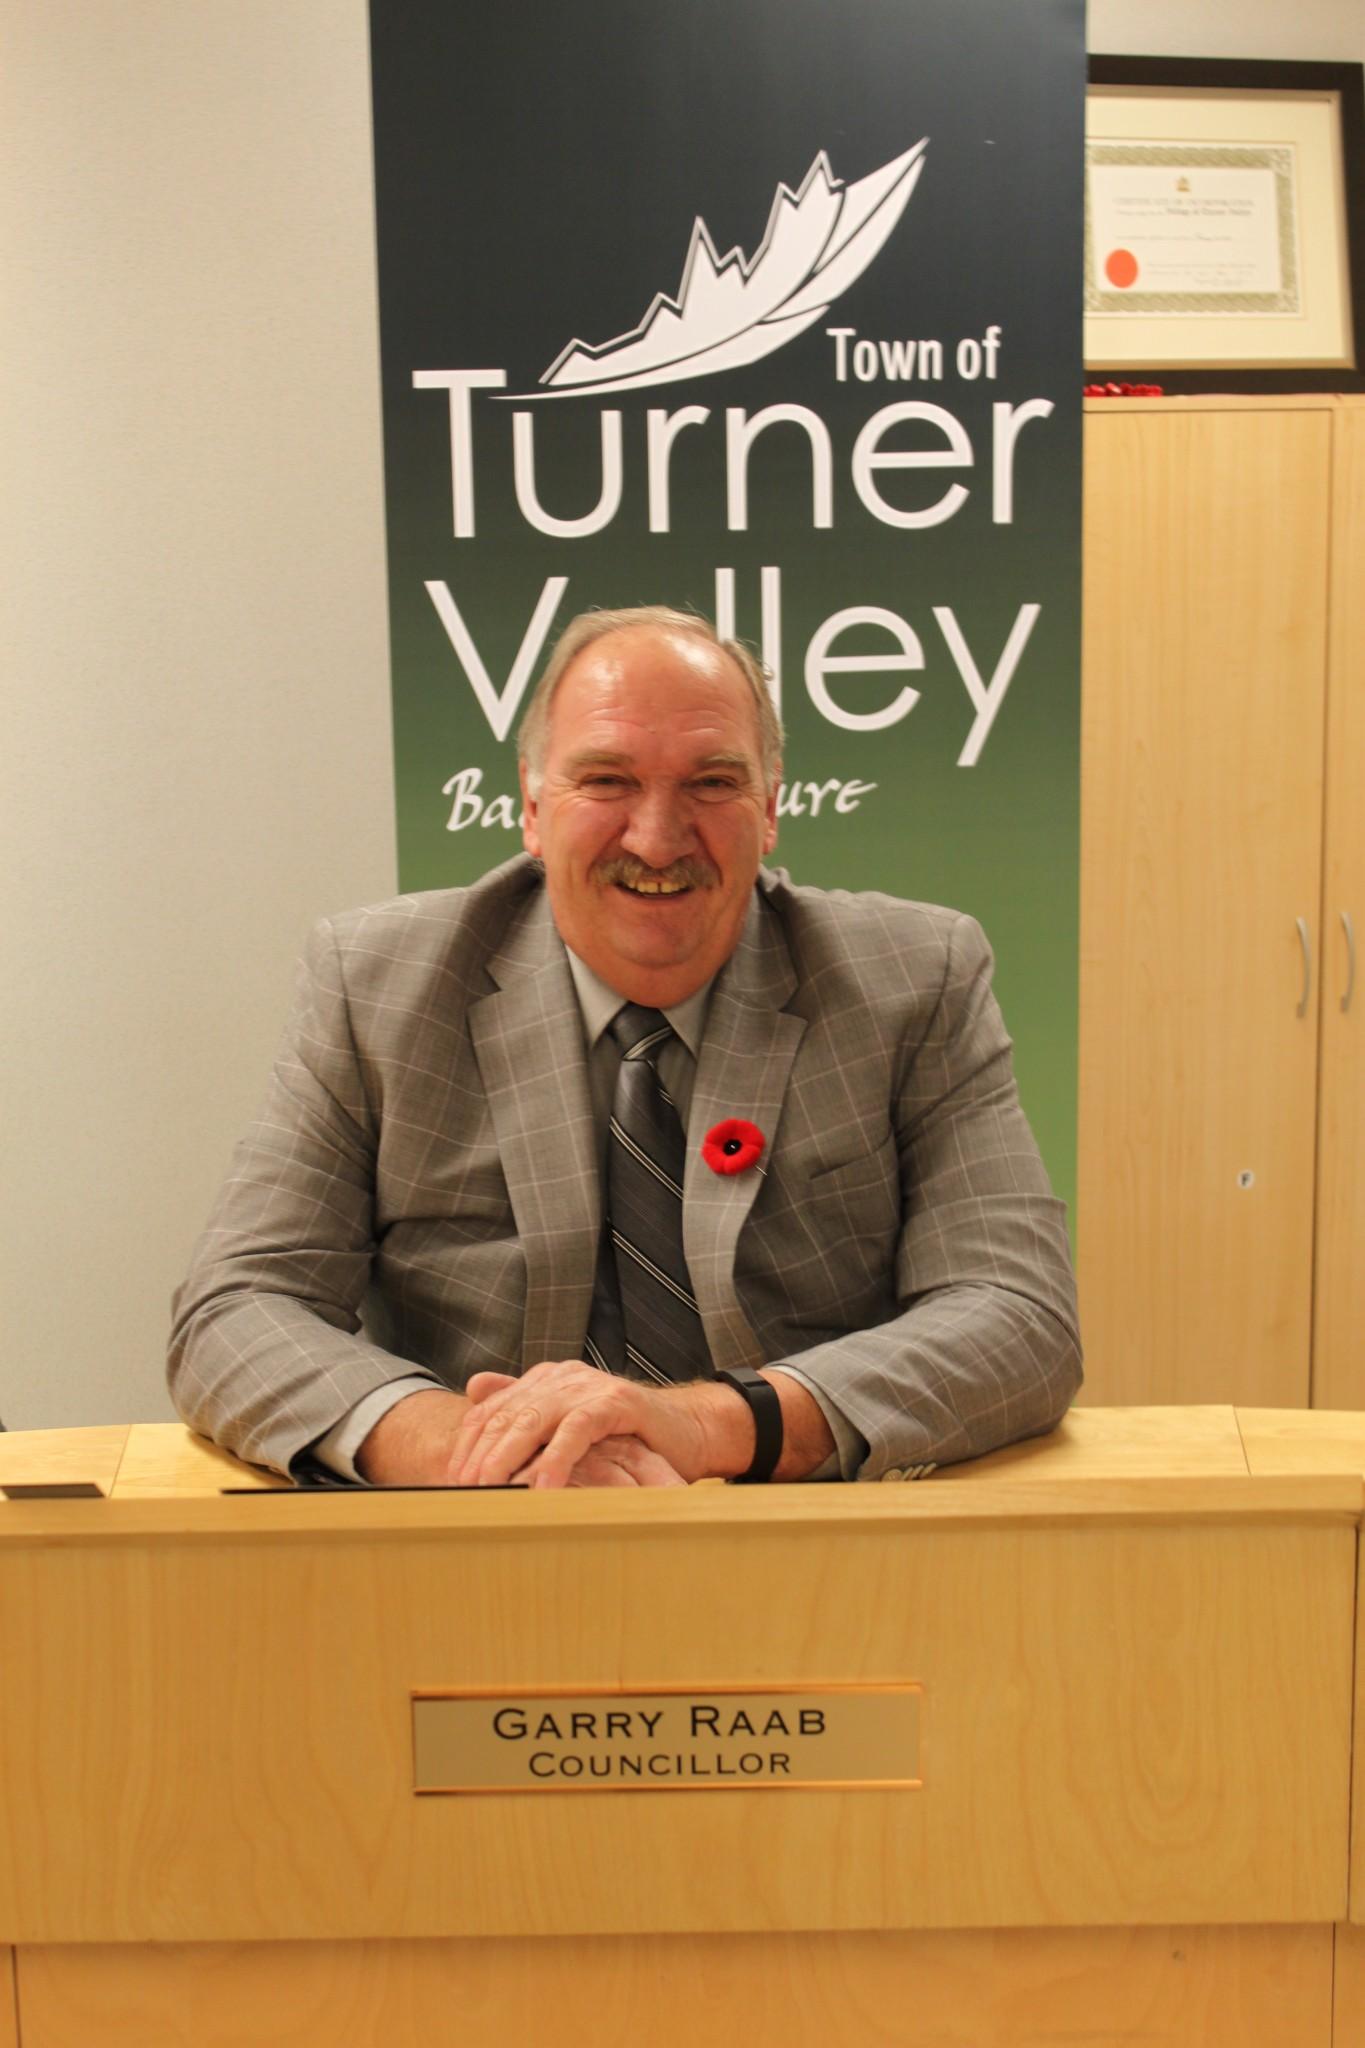 Councillor Garry Raab